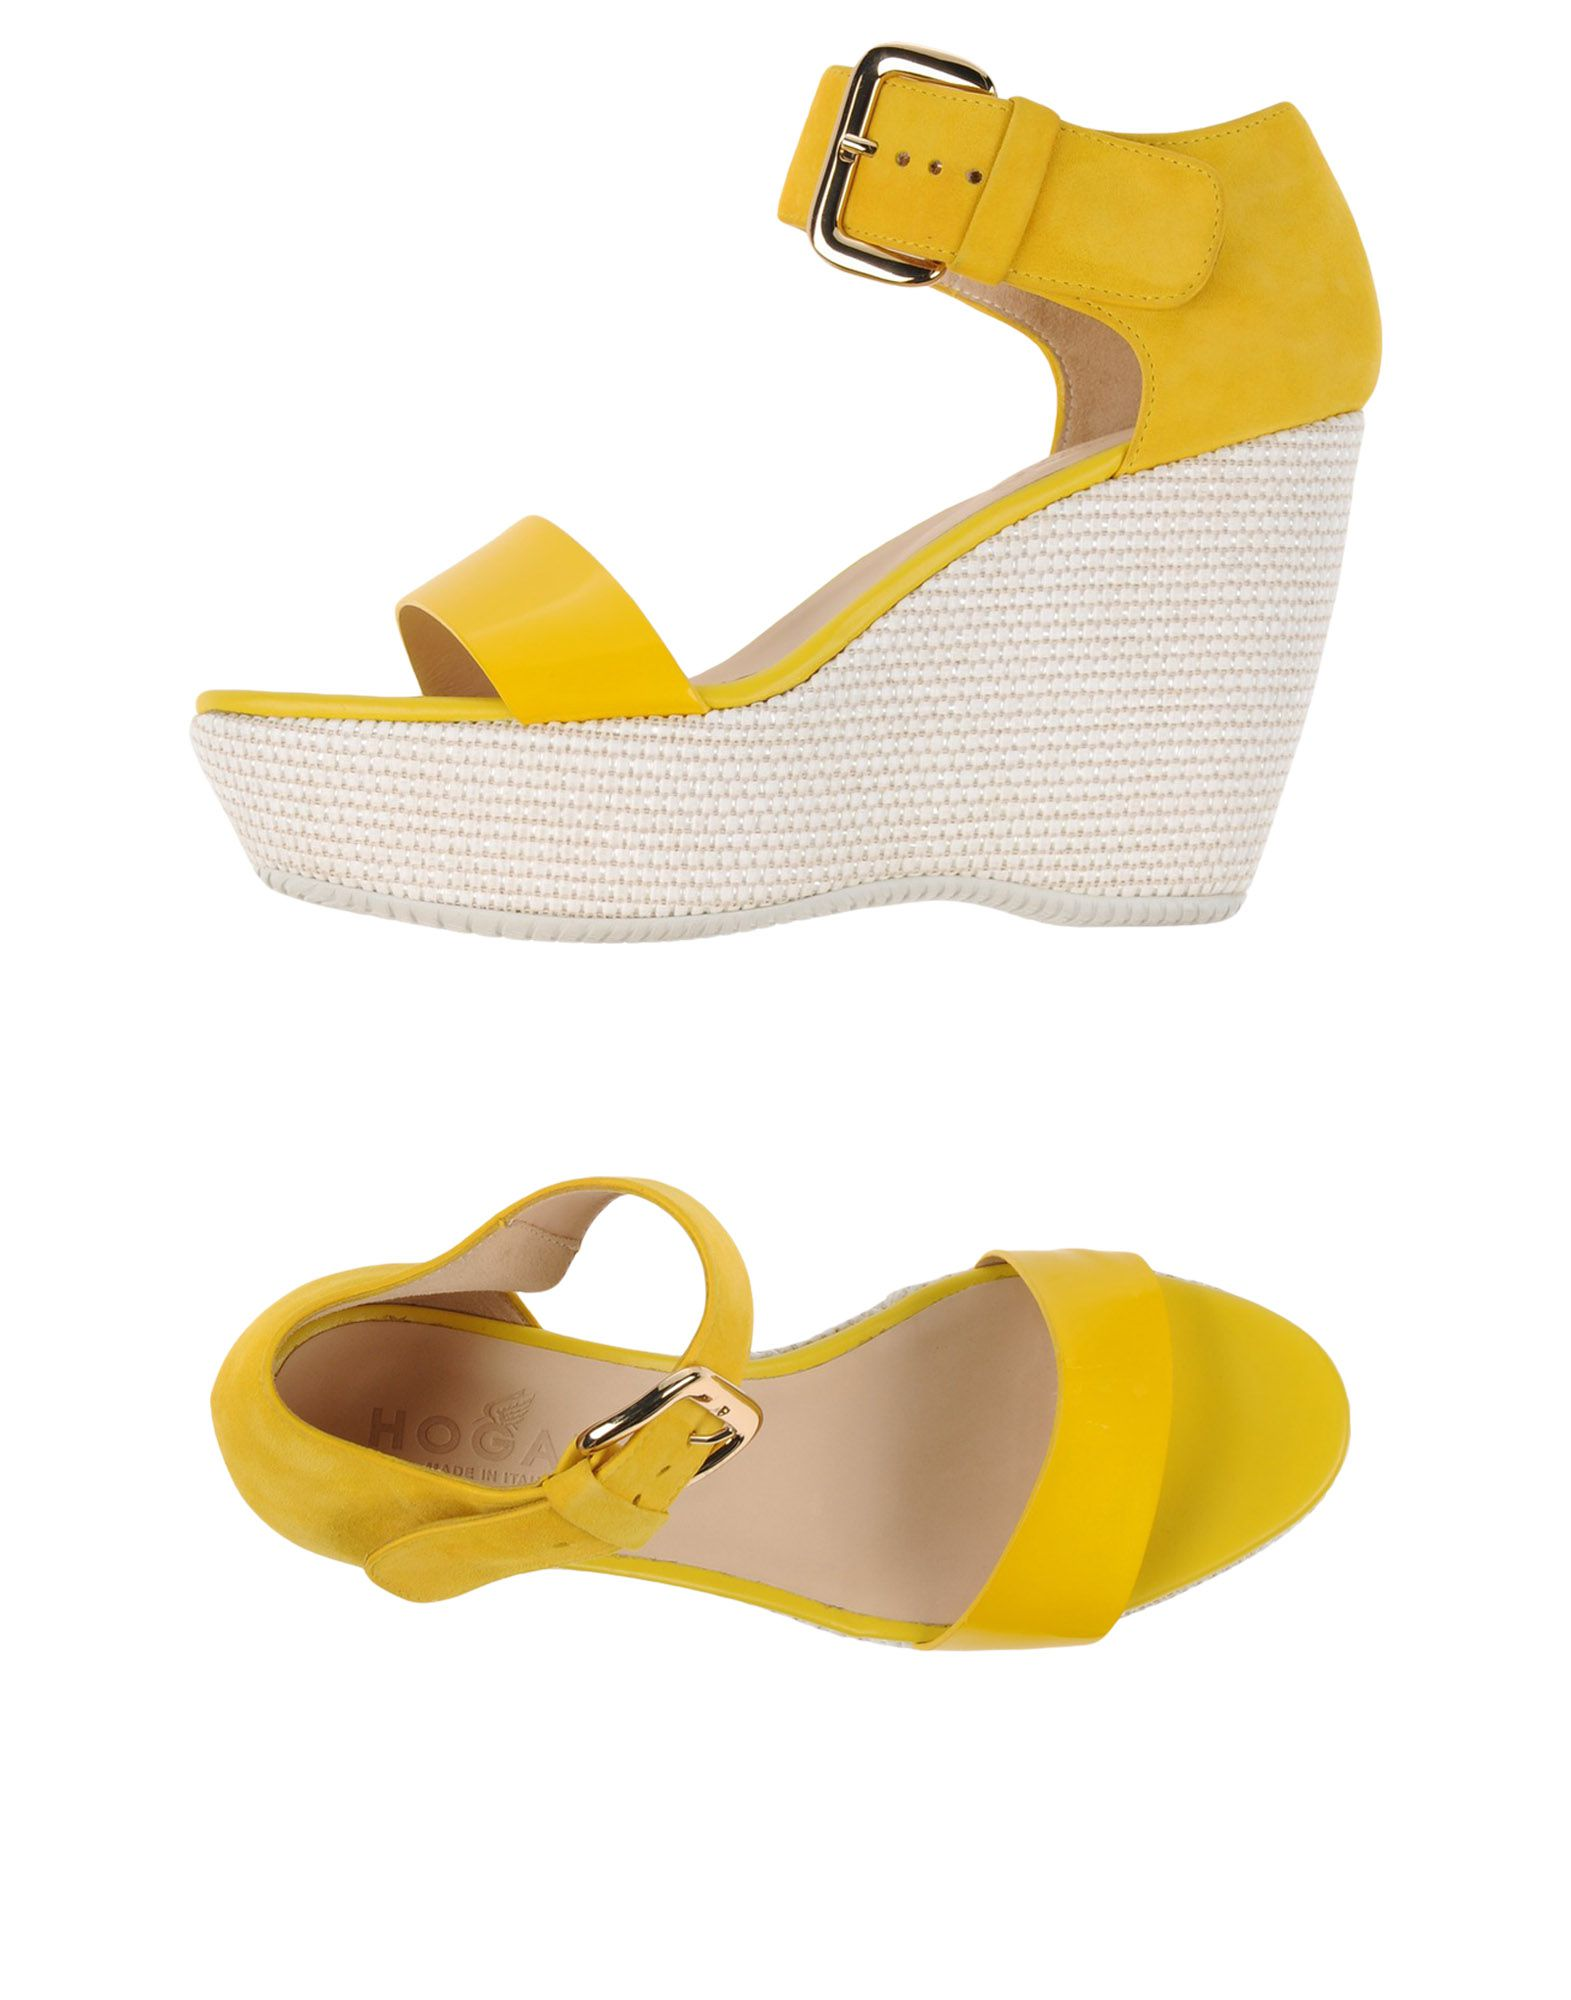 Hogan Sandalen Schuhe Damen  11173371DP Heiße Schuhe Sandalen 3163fb